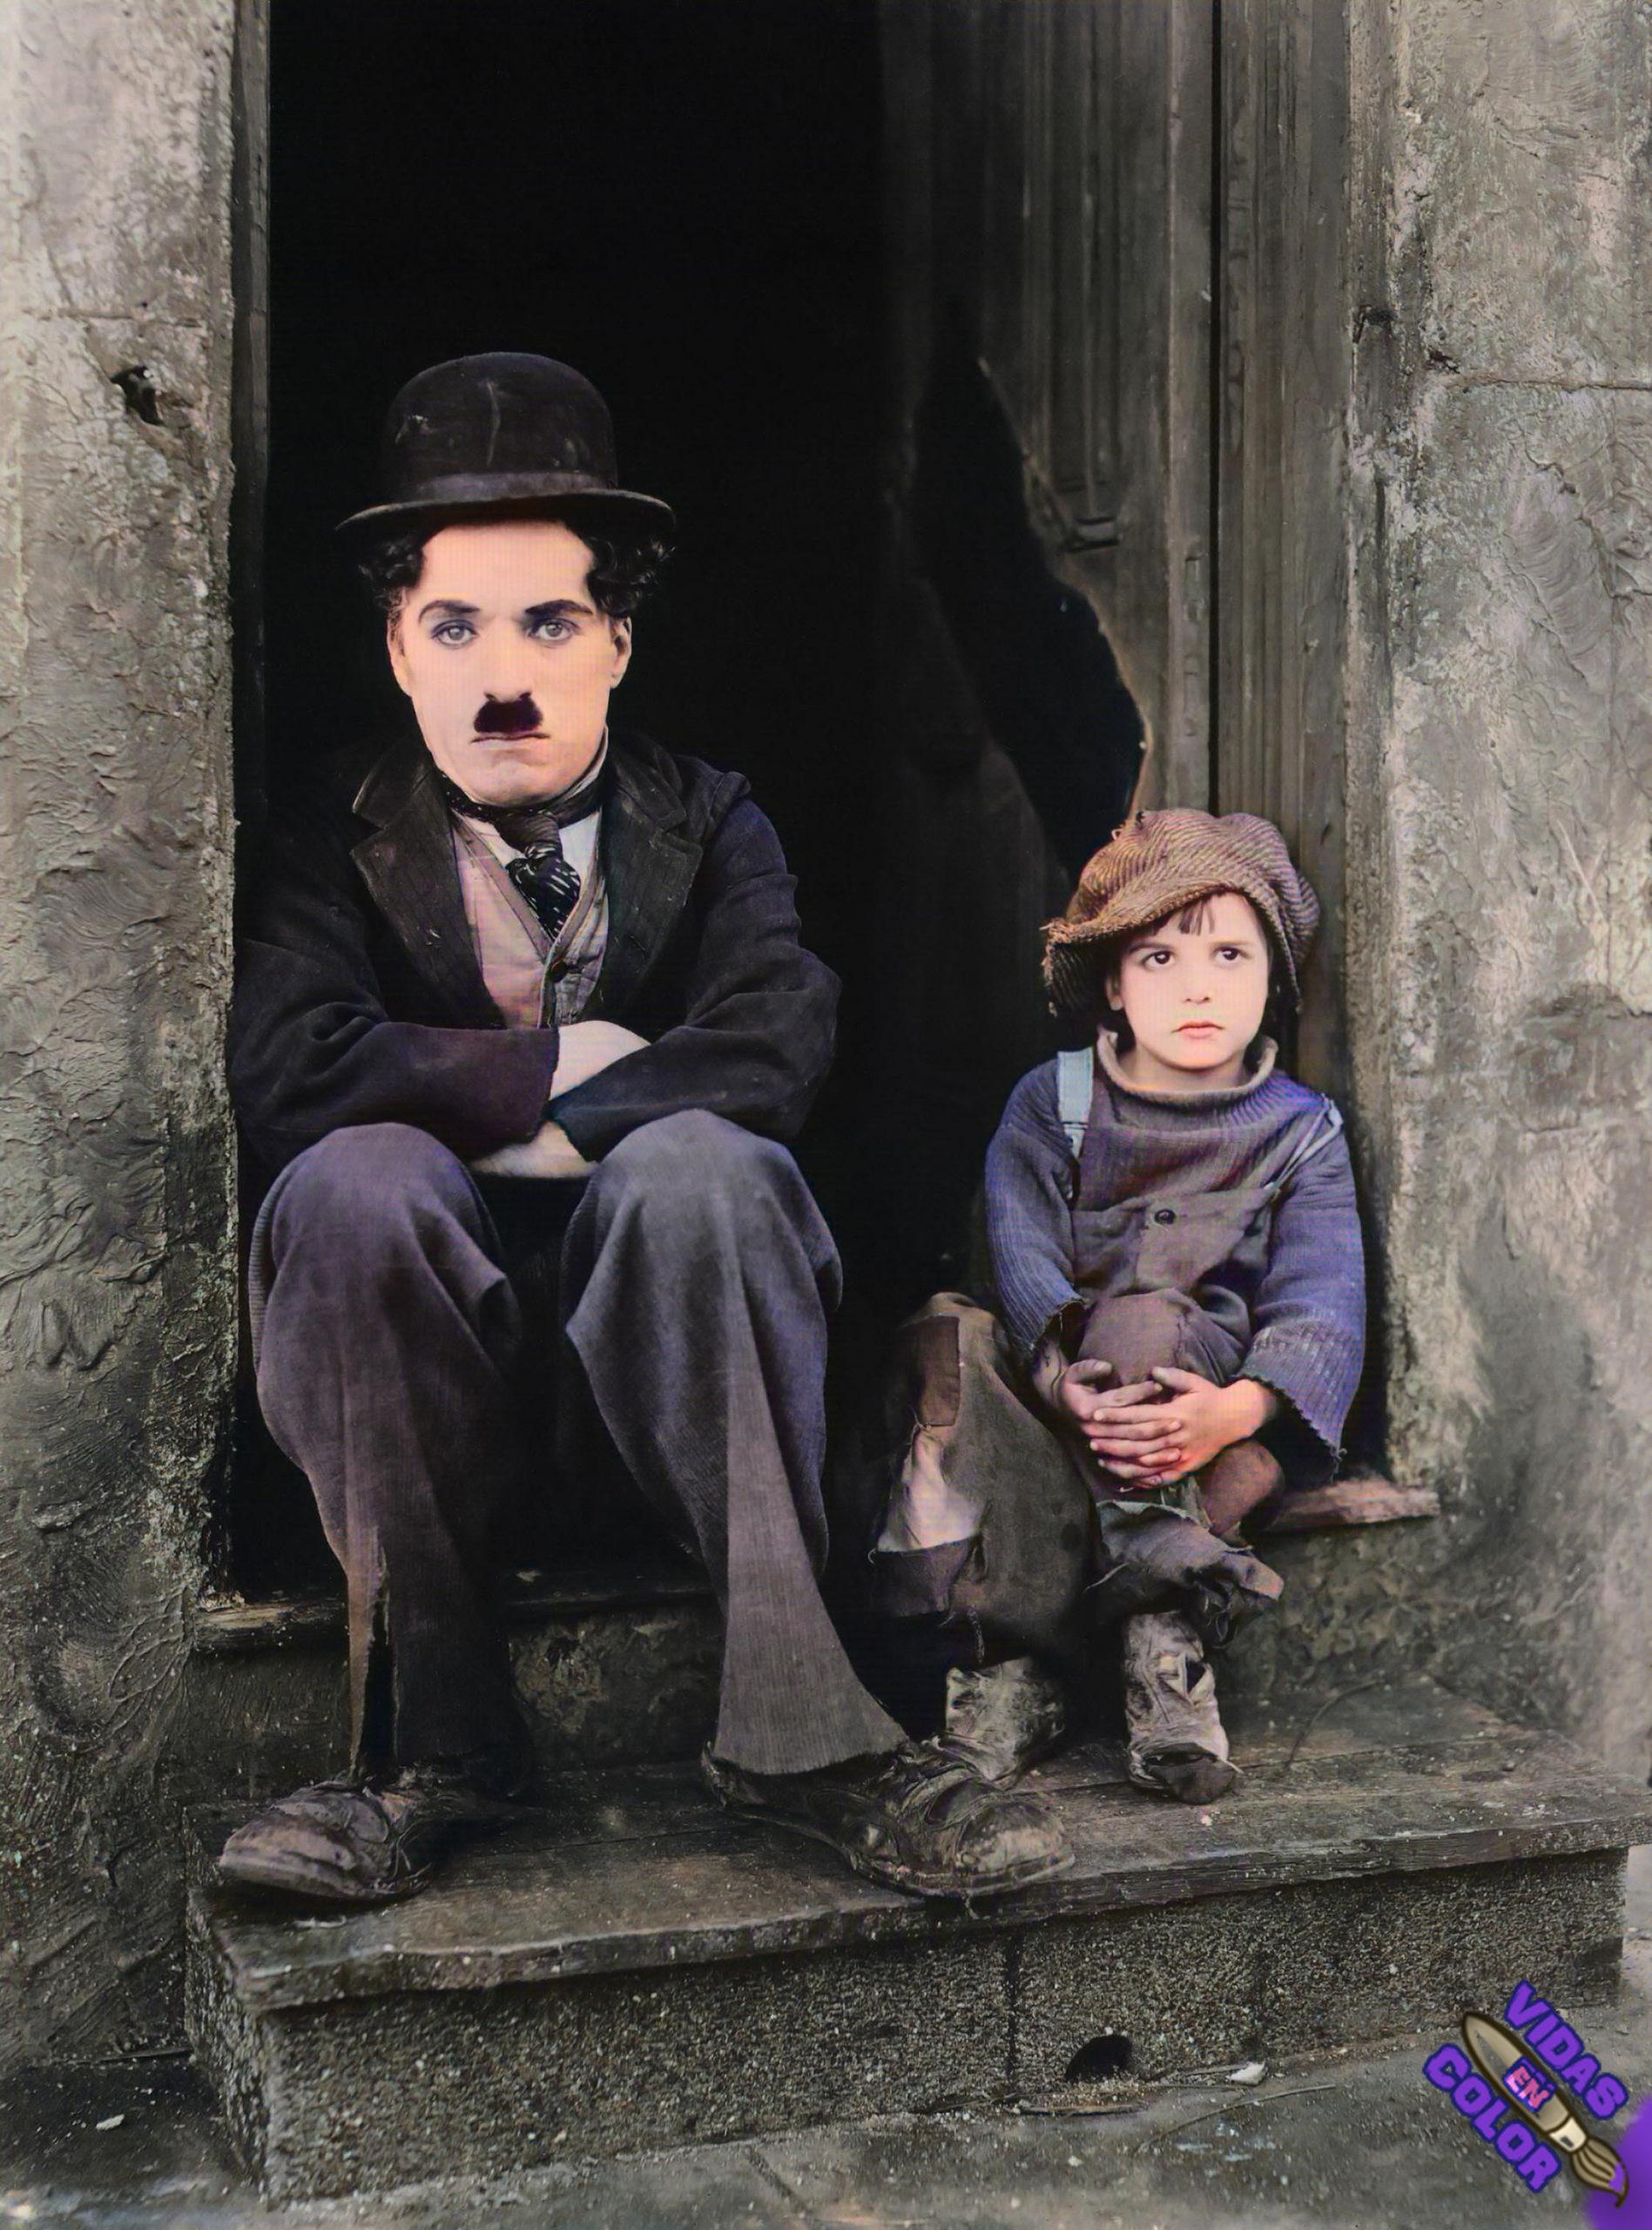 Chaplin_The_Kid_edit_color